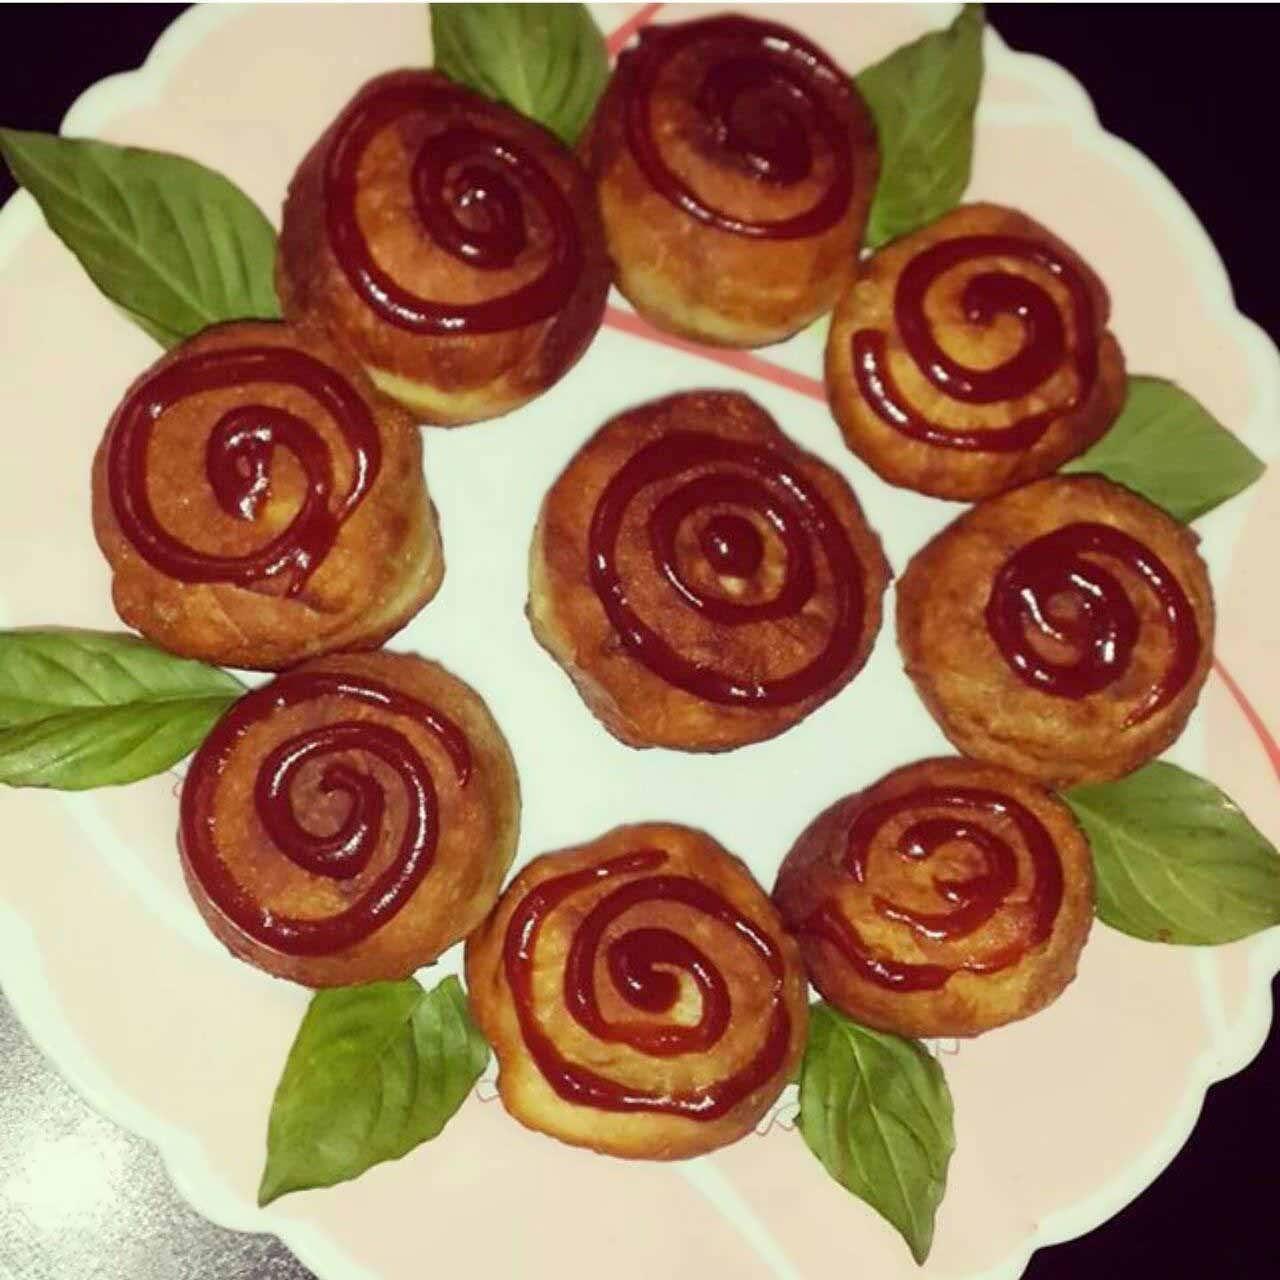 sos - ایده های جالب تزیین غذا با سس